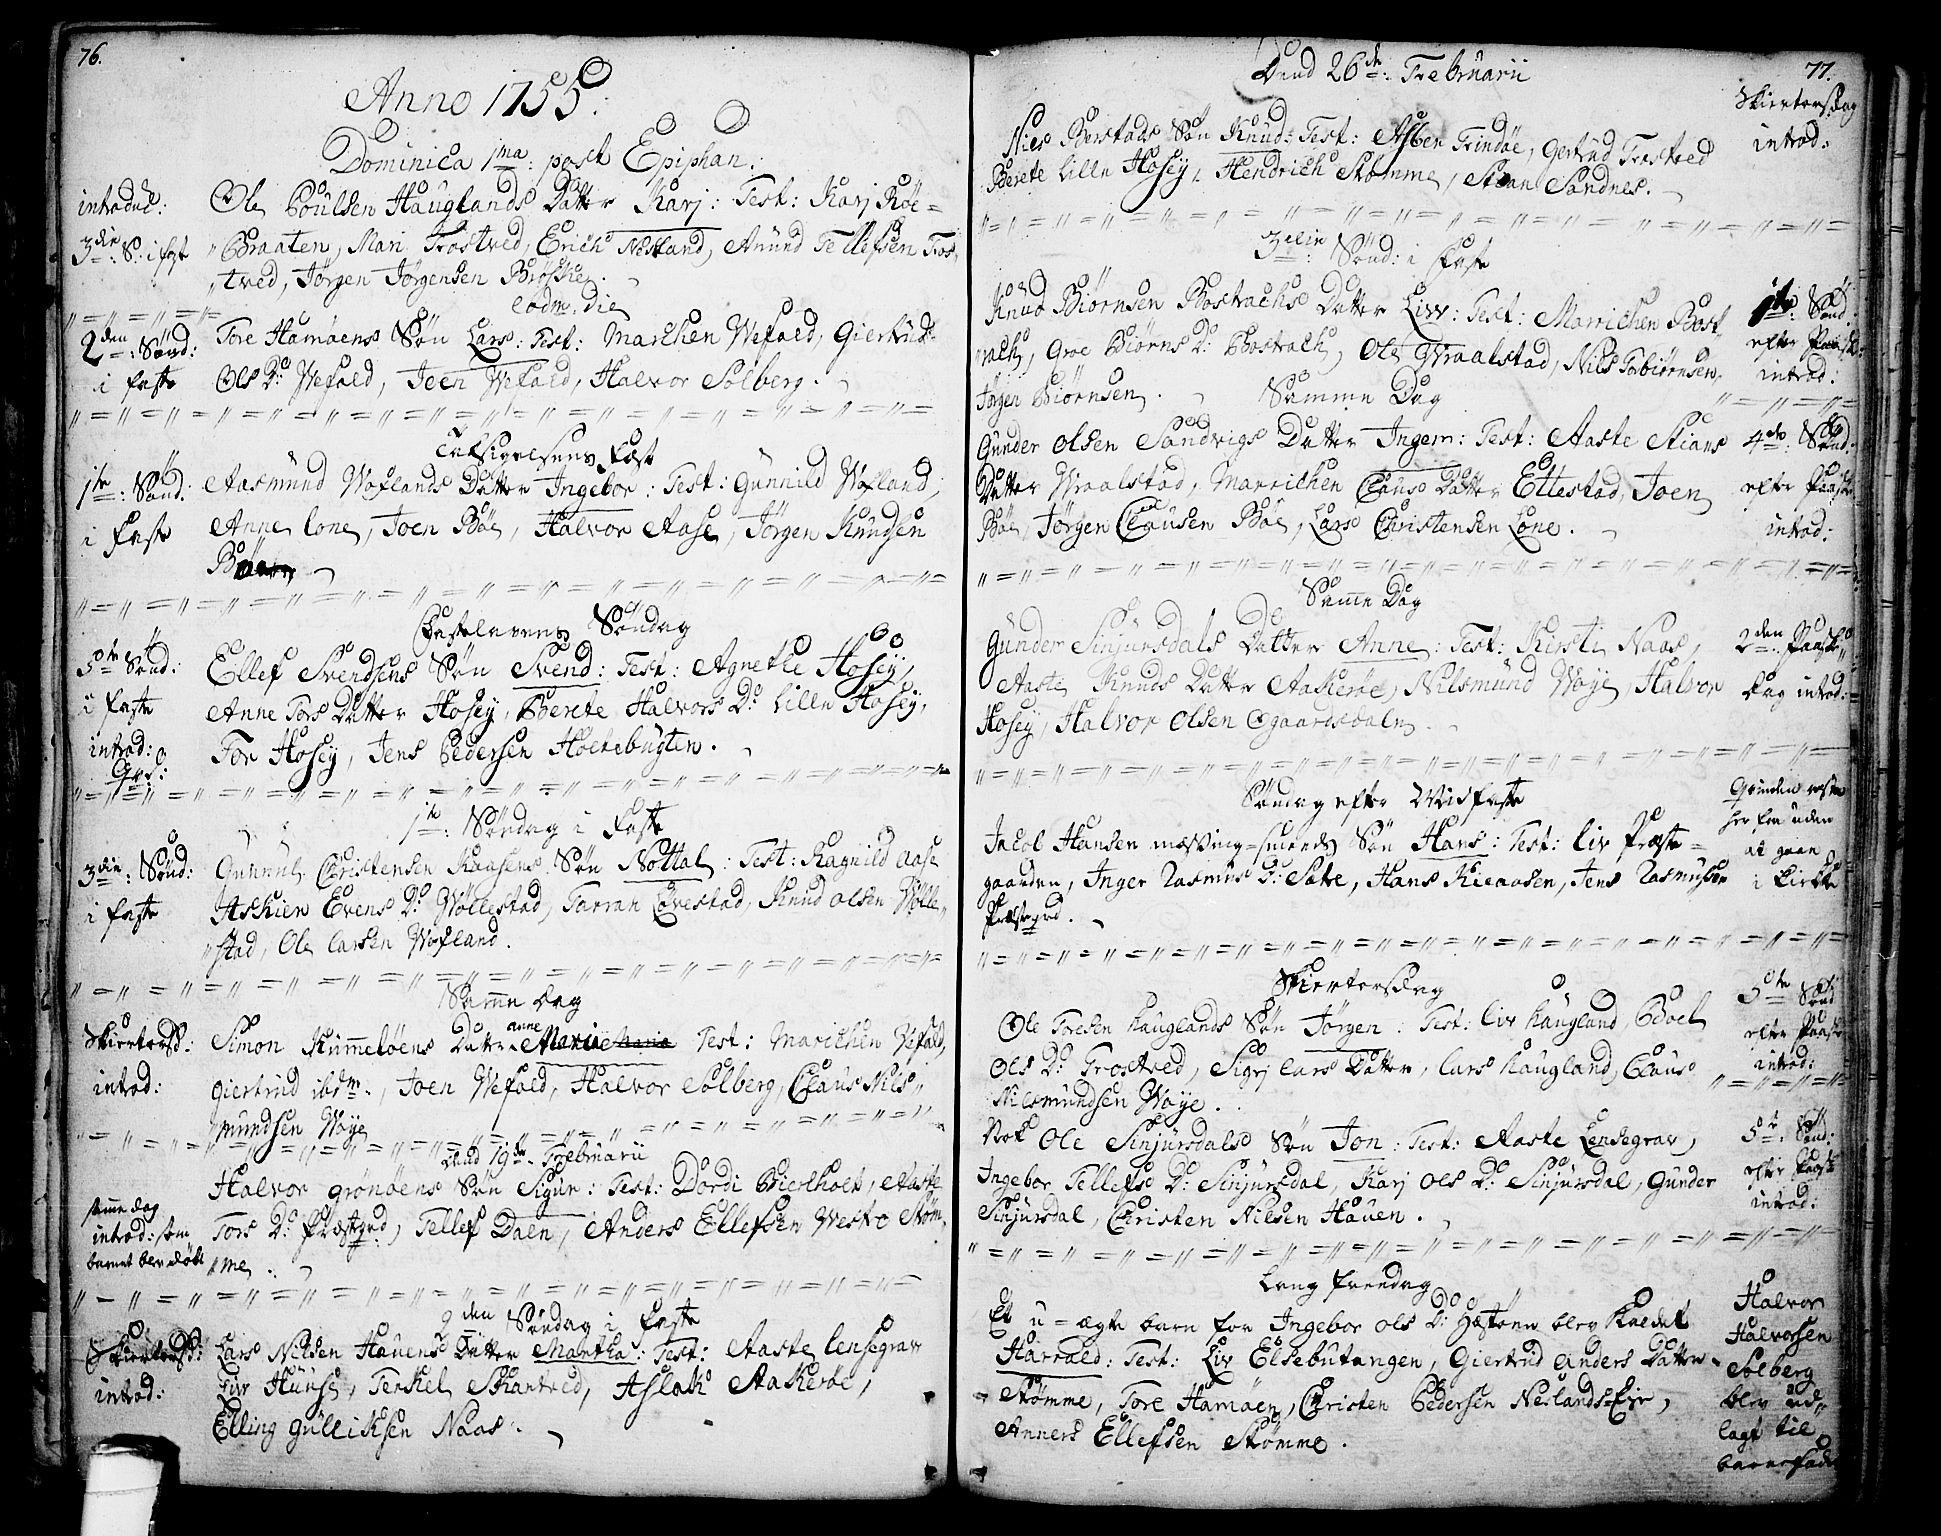 SAKO, Drangedal kirkebøker, F/Fa/L0001: Ministerialbok nr. 1, 1697-1767, s. 76-77